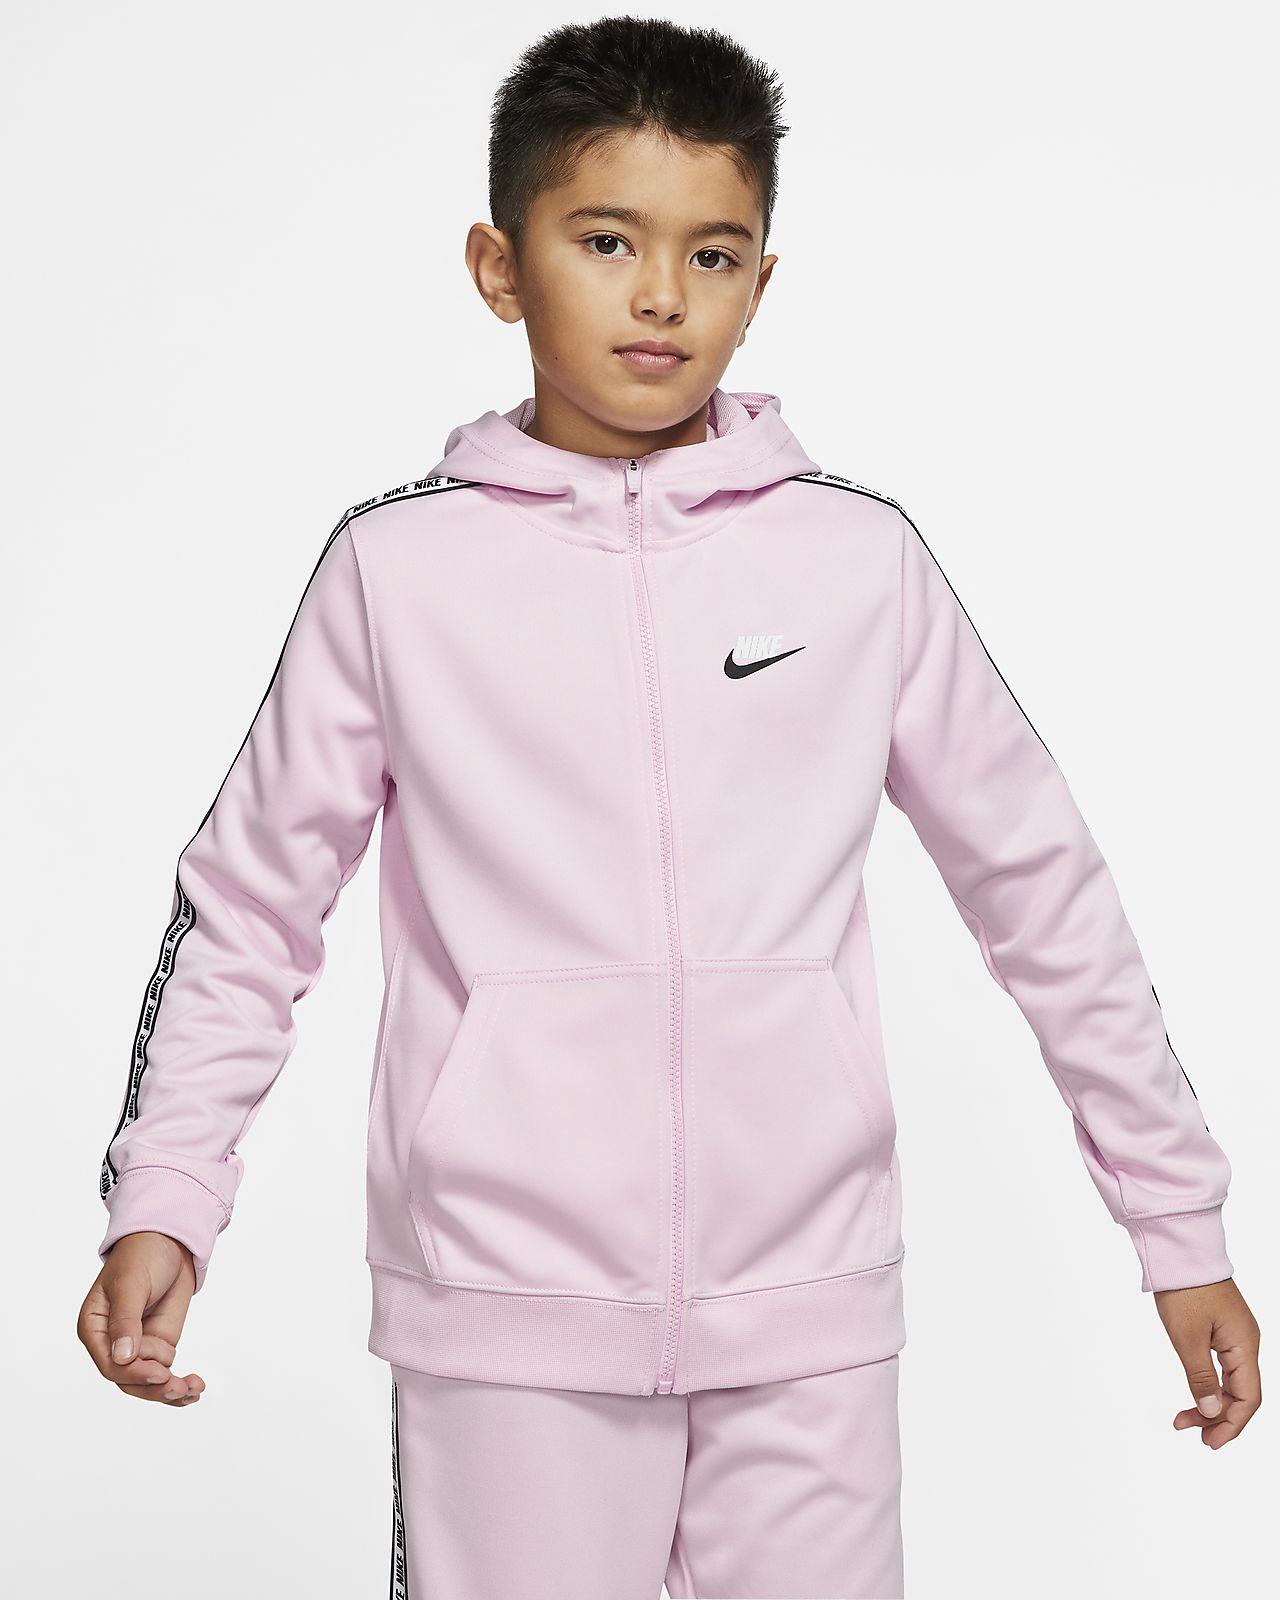 Nike Sportswear Dessuadora amb caputxa i cremallera completa - Nen/a